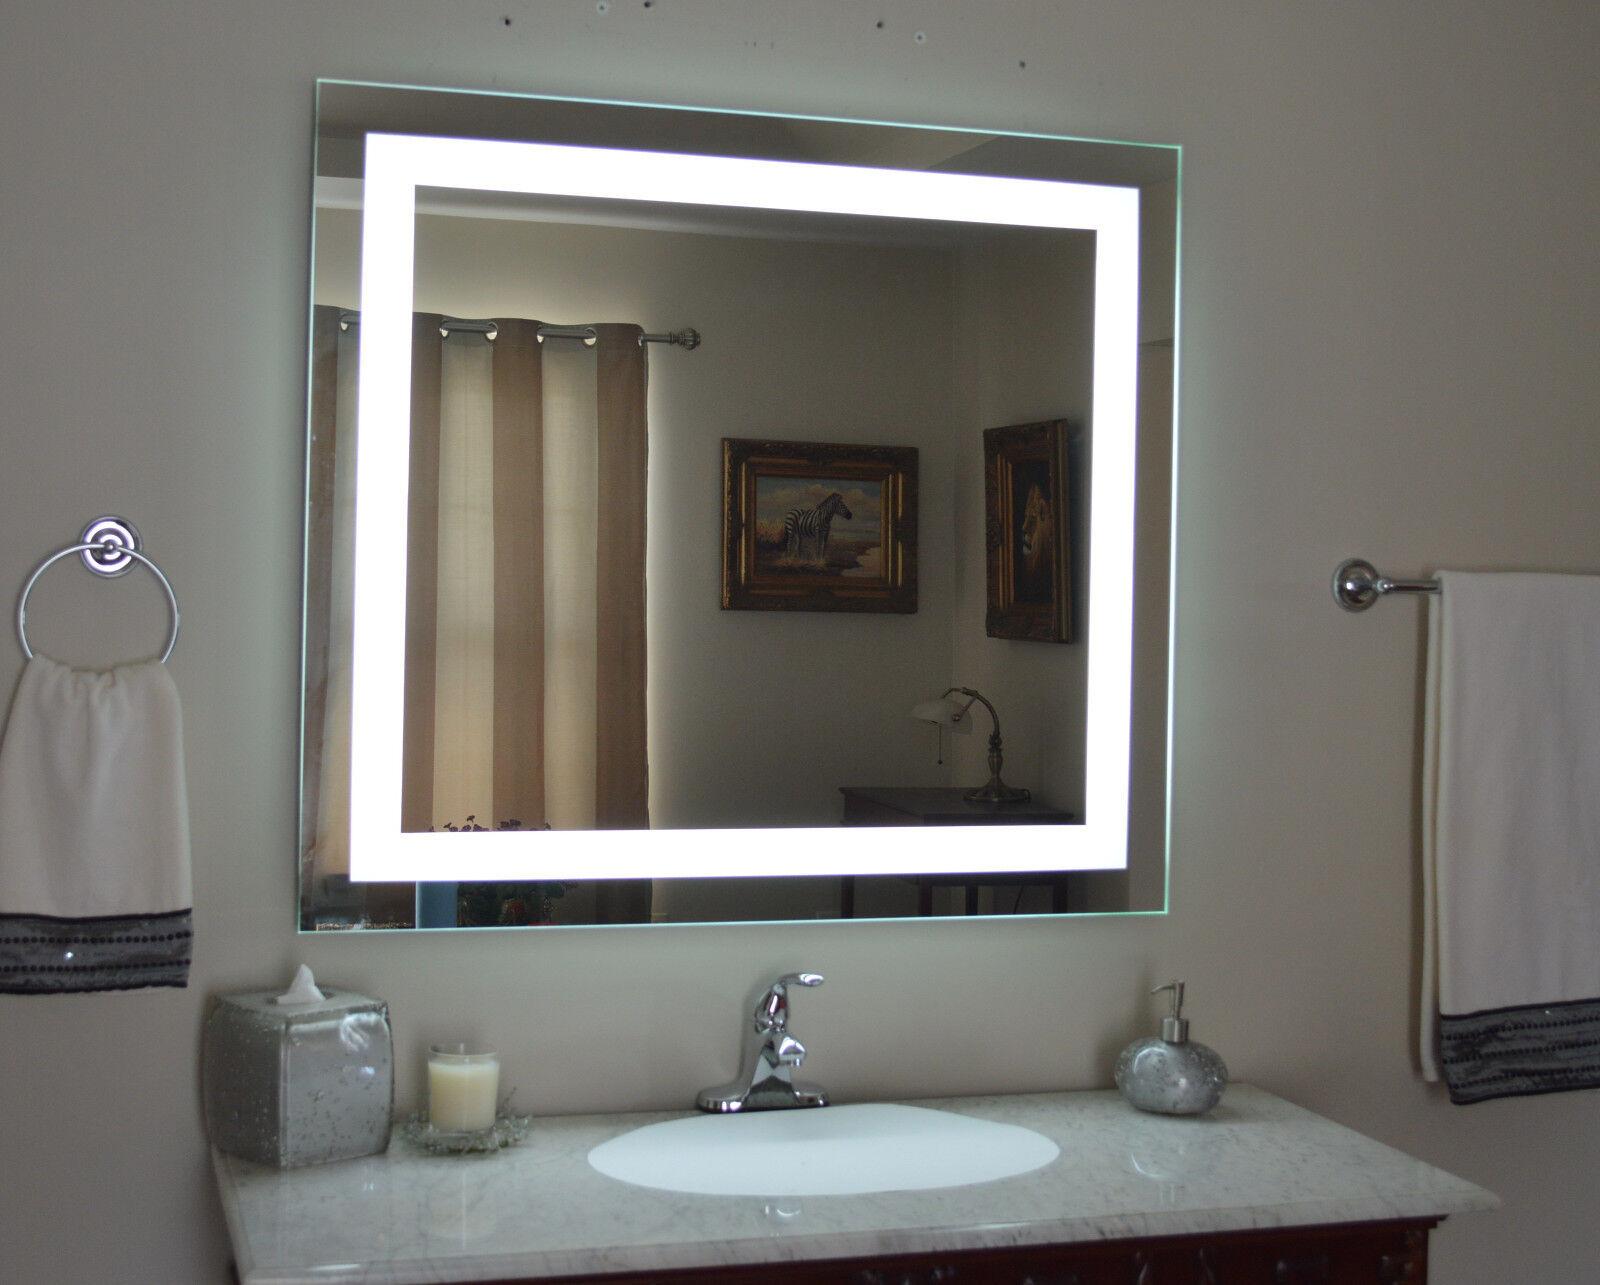 "Lighted Bathroom Vanity Mirrors lighted bathroom vanity mirror, led , wall mounted, 48"" wide x 36"